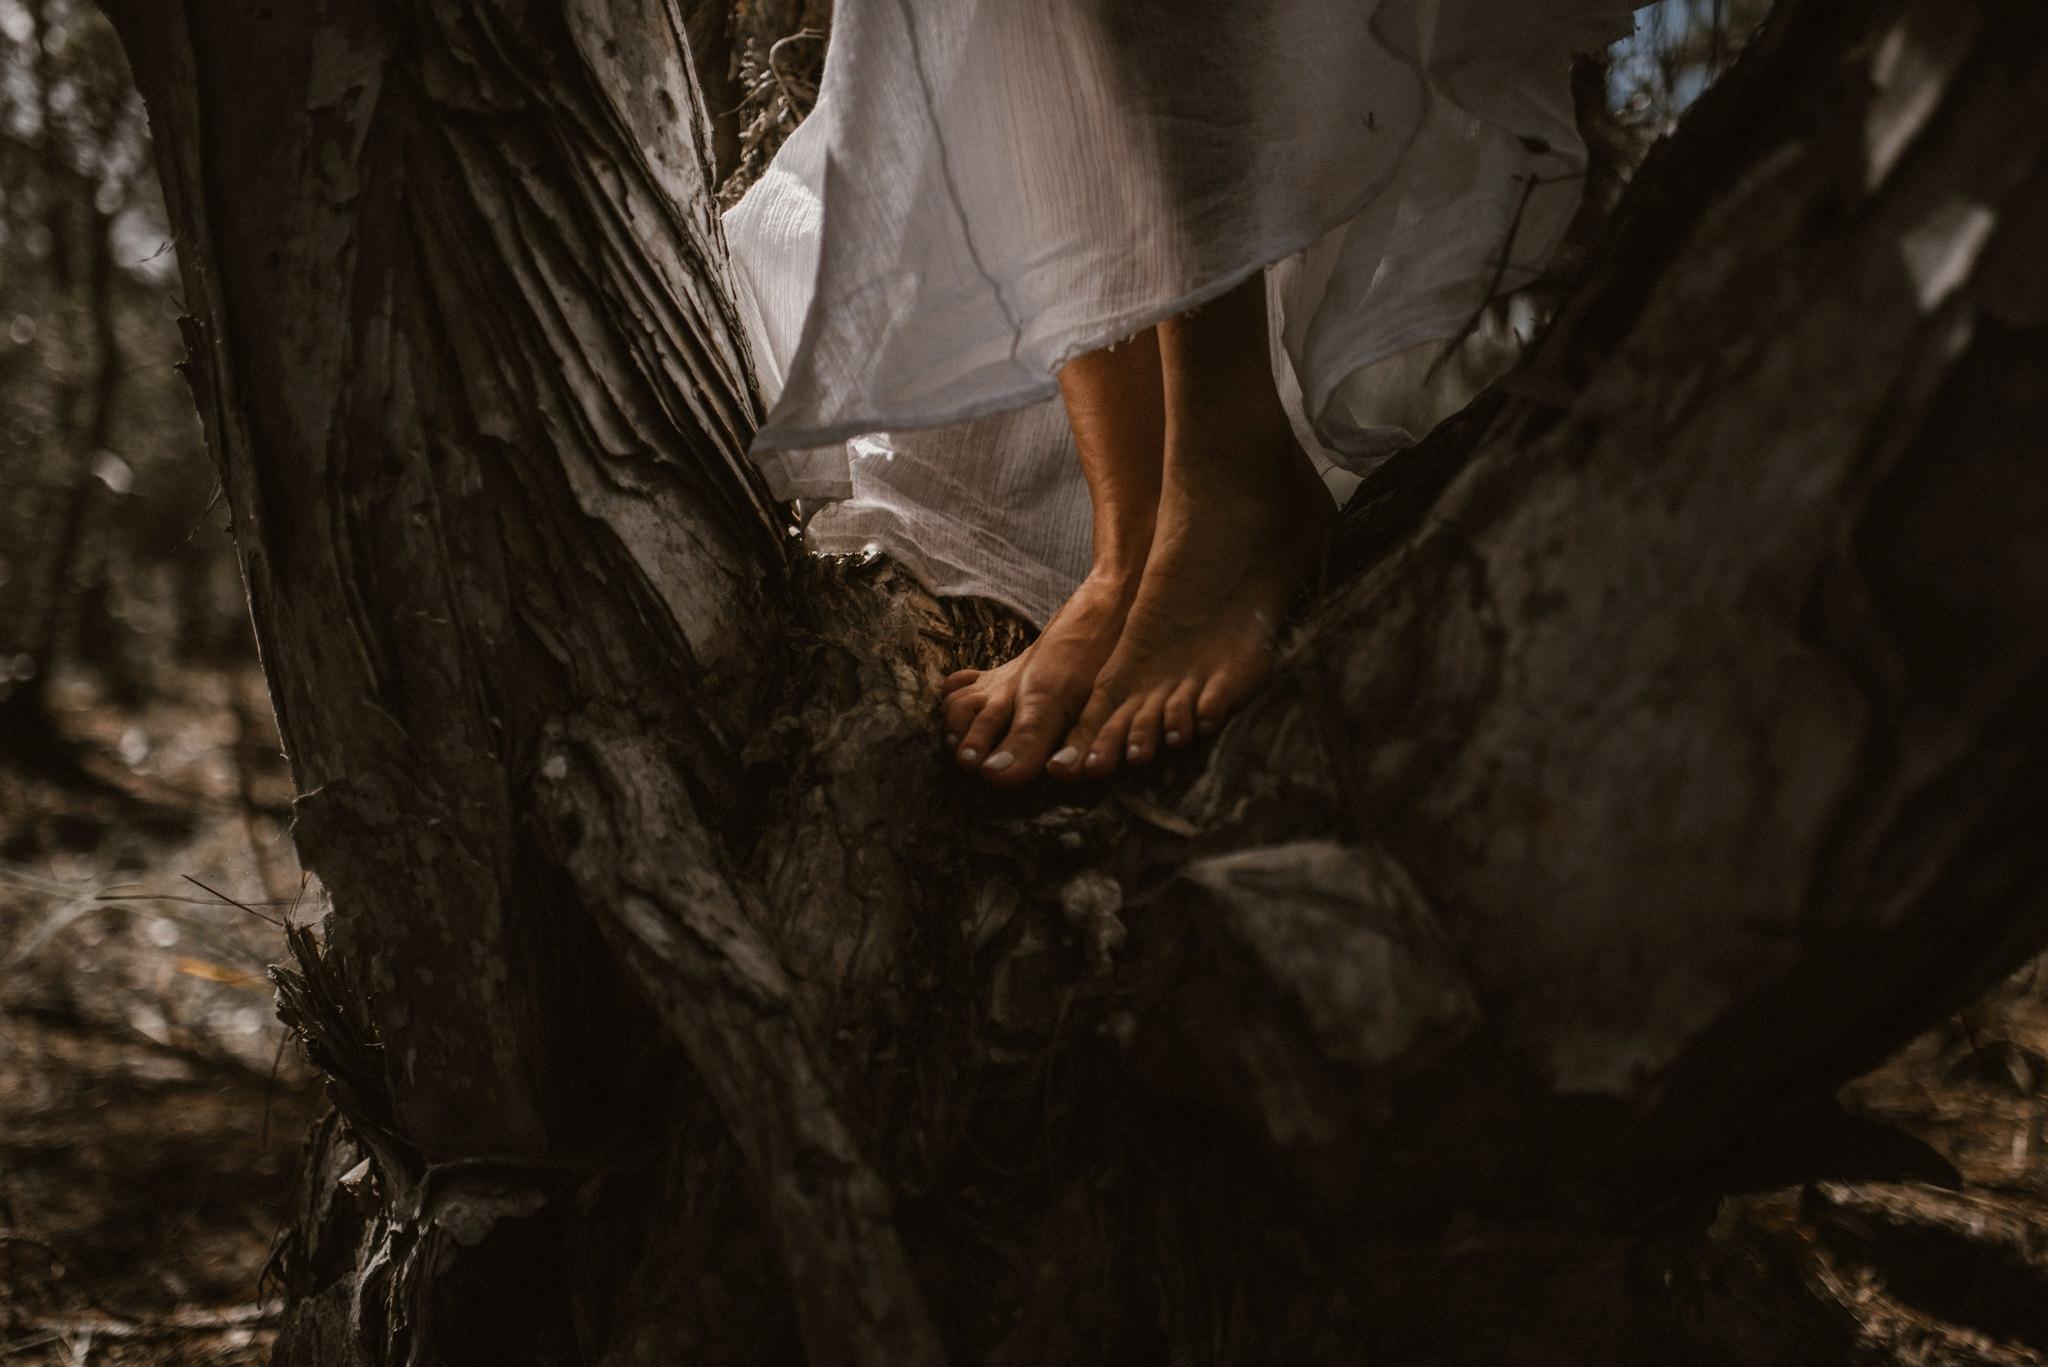 twyla jones photography - traveling dress--20_treasure coast florida.jpg